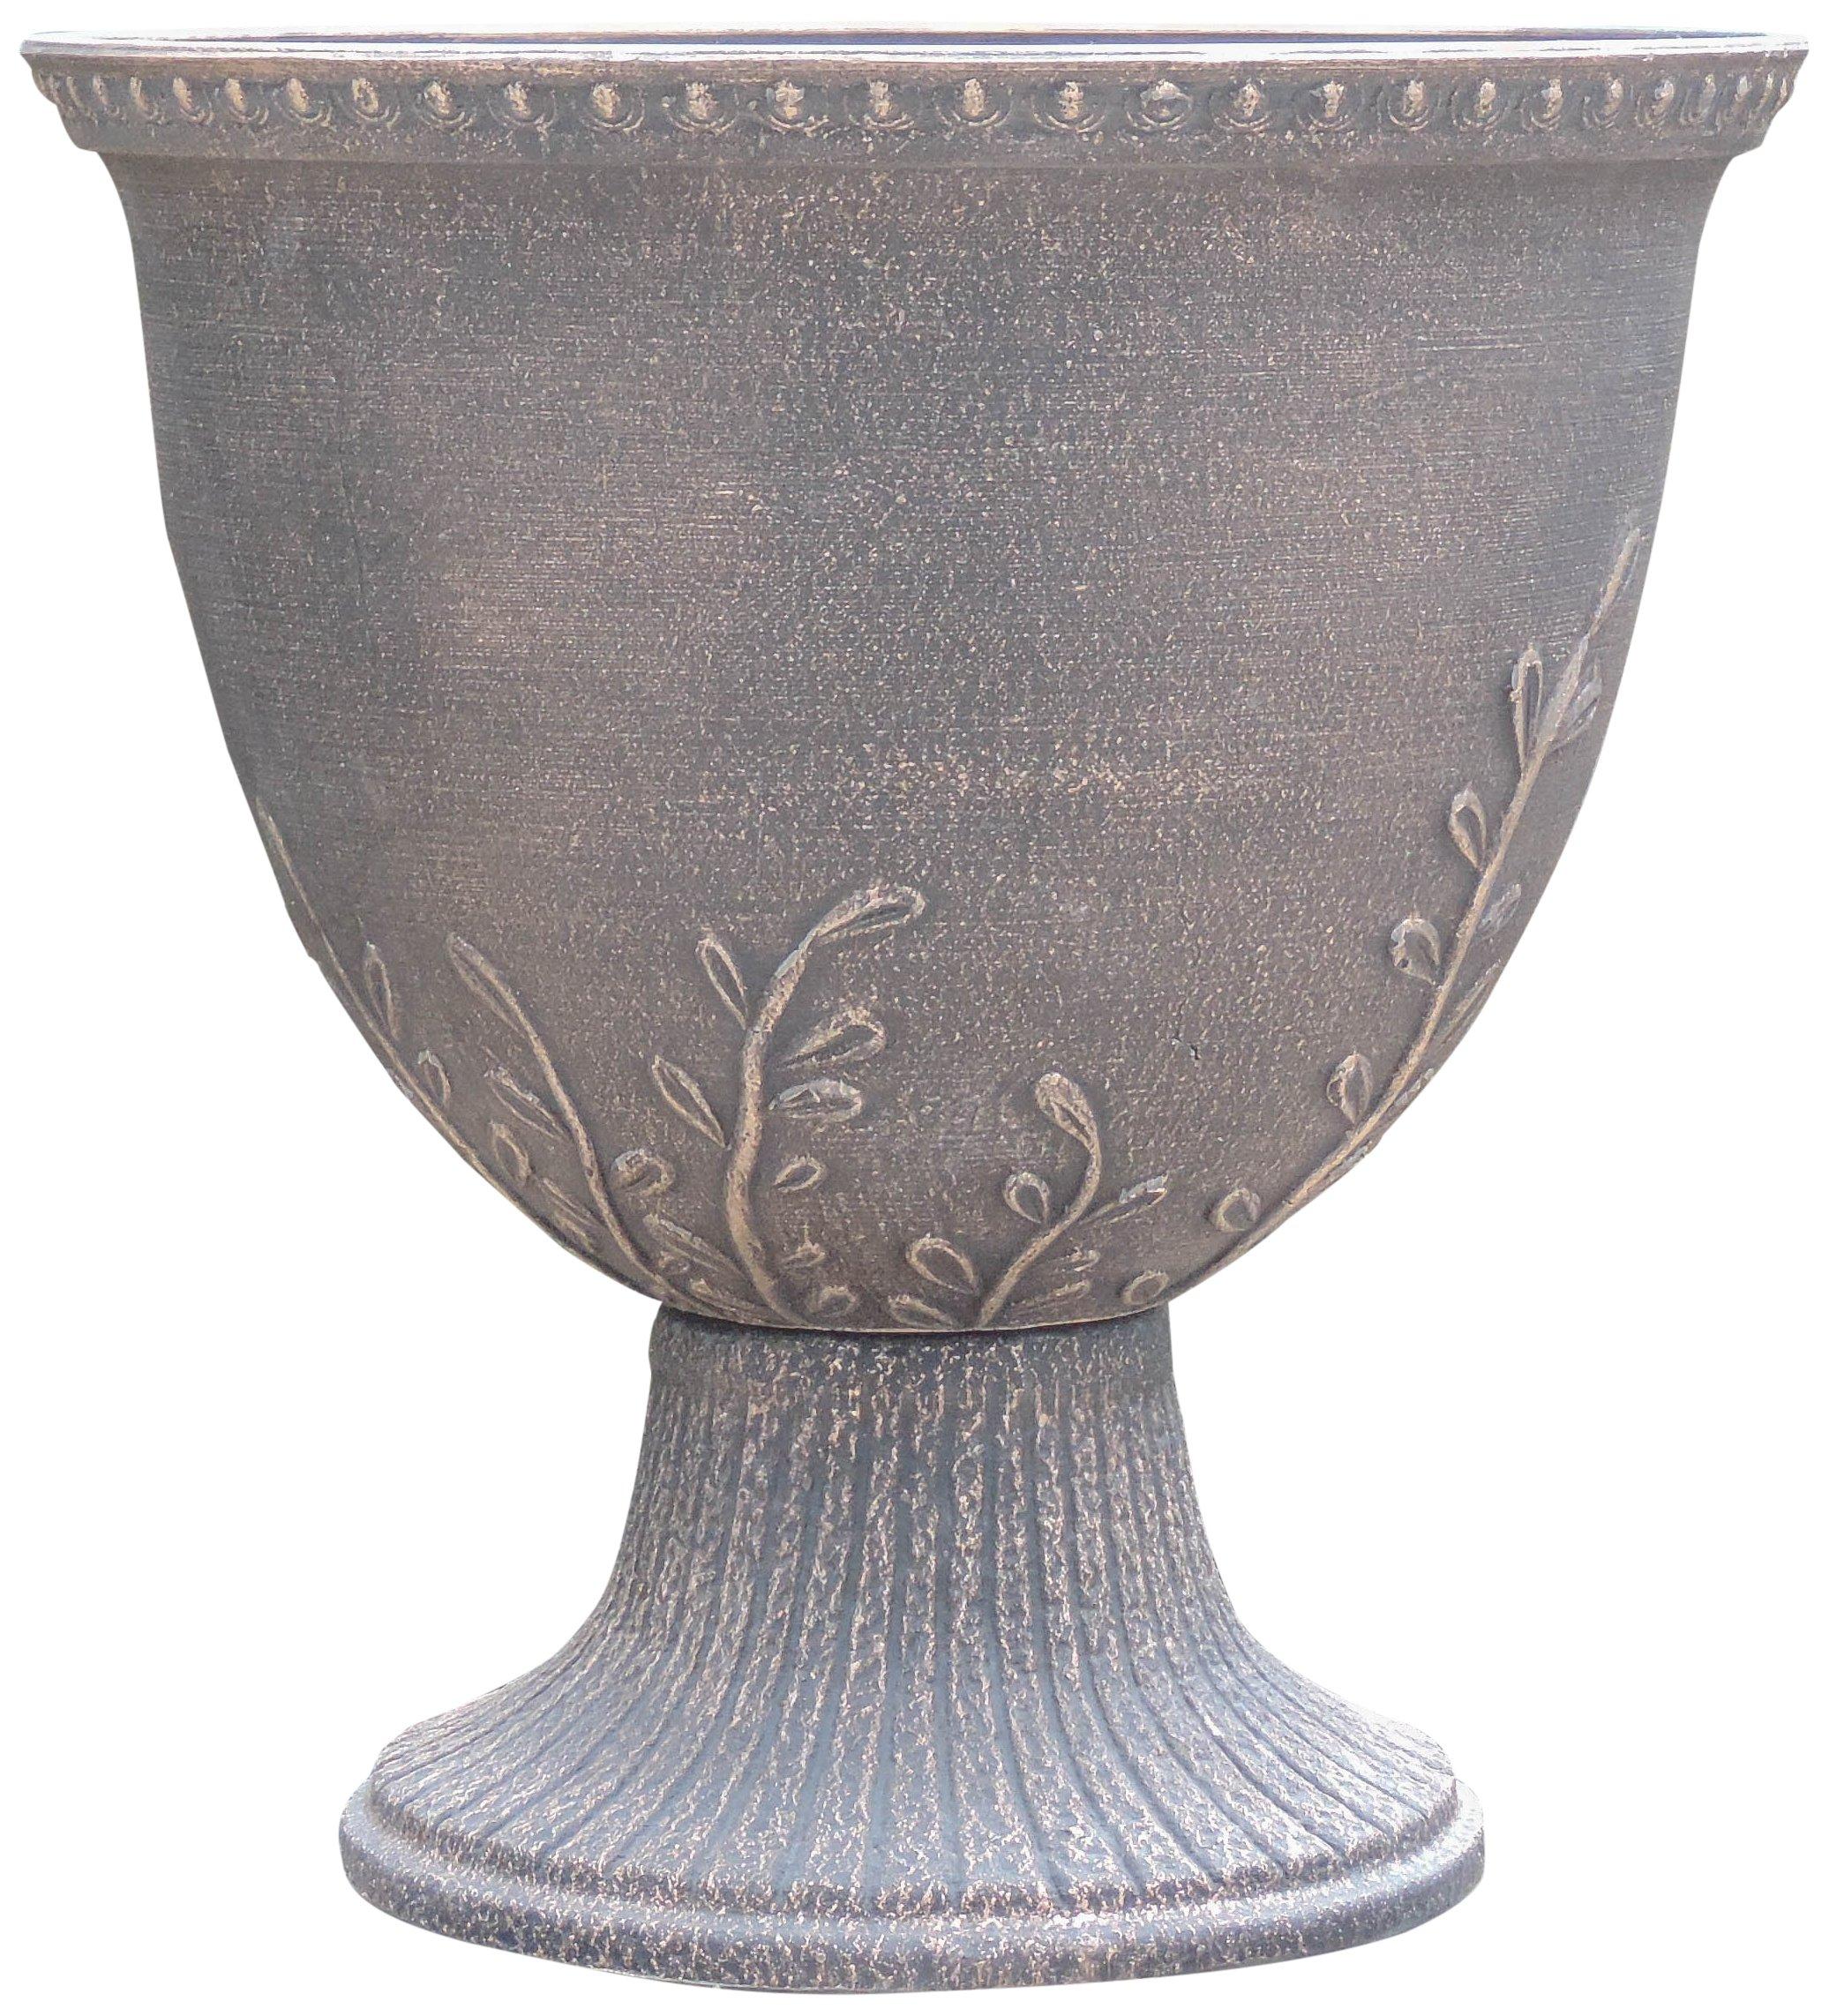 GCD-Austram Sycamore Urn, Dusk Gray